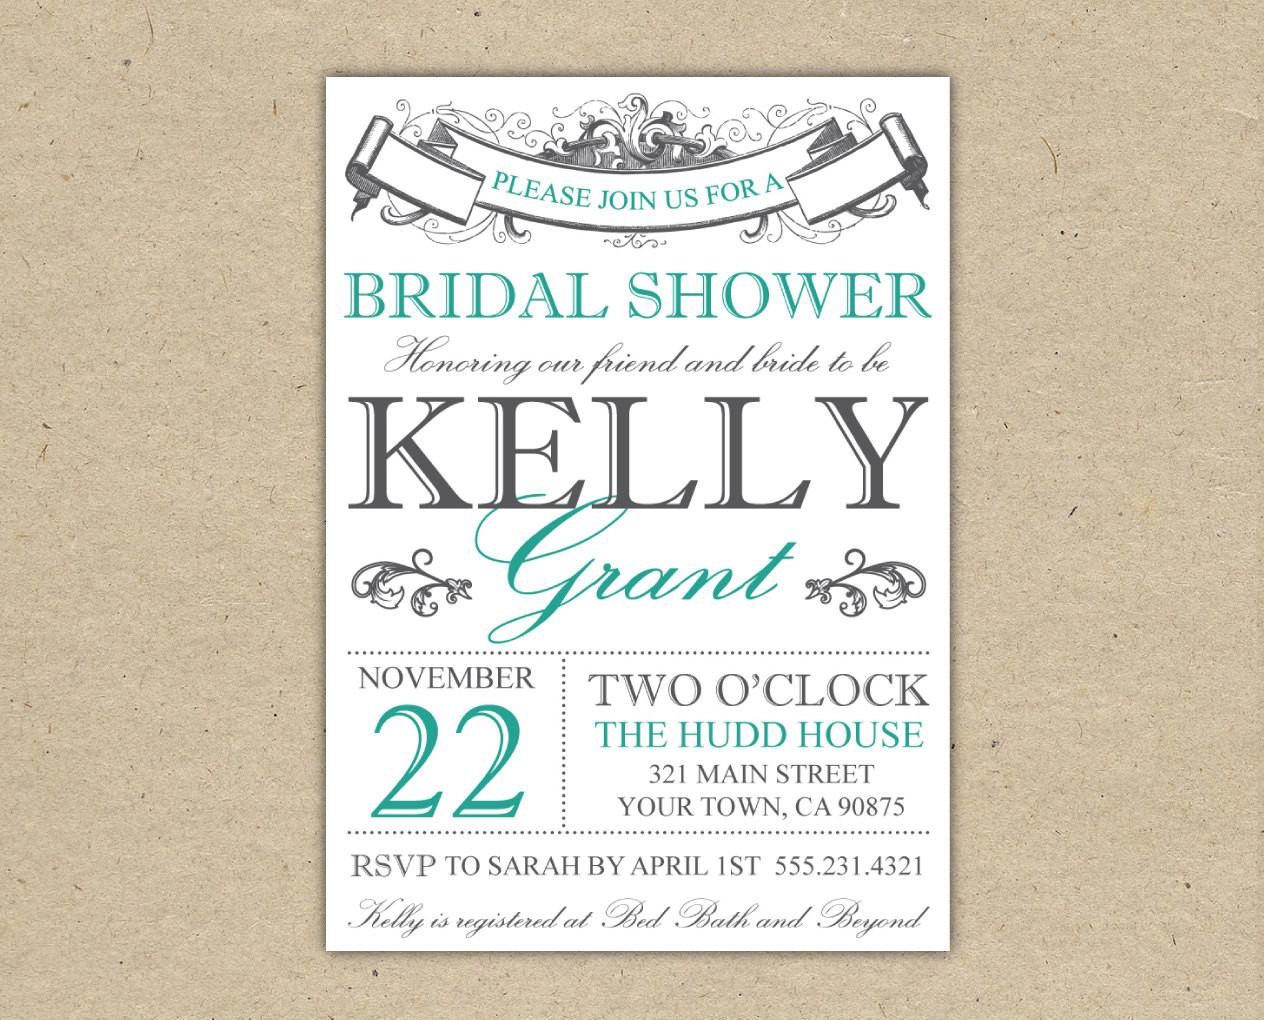 013 Free Bridal Shower Invitation Templates Printable Invitations - Free Printable Bridal Shower Invitations Templates